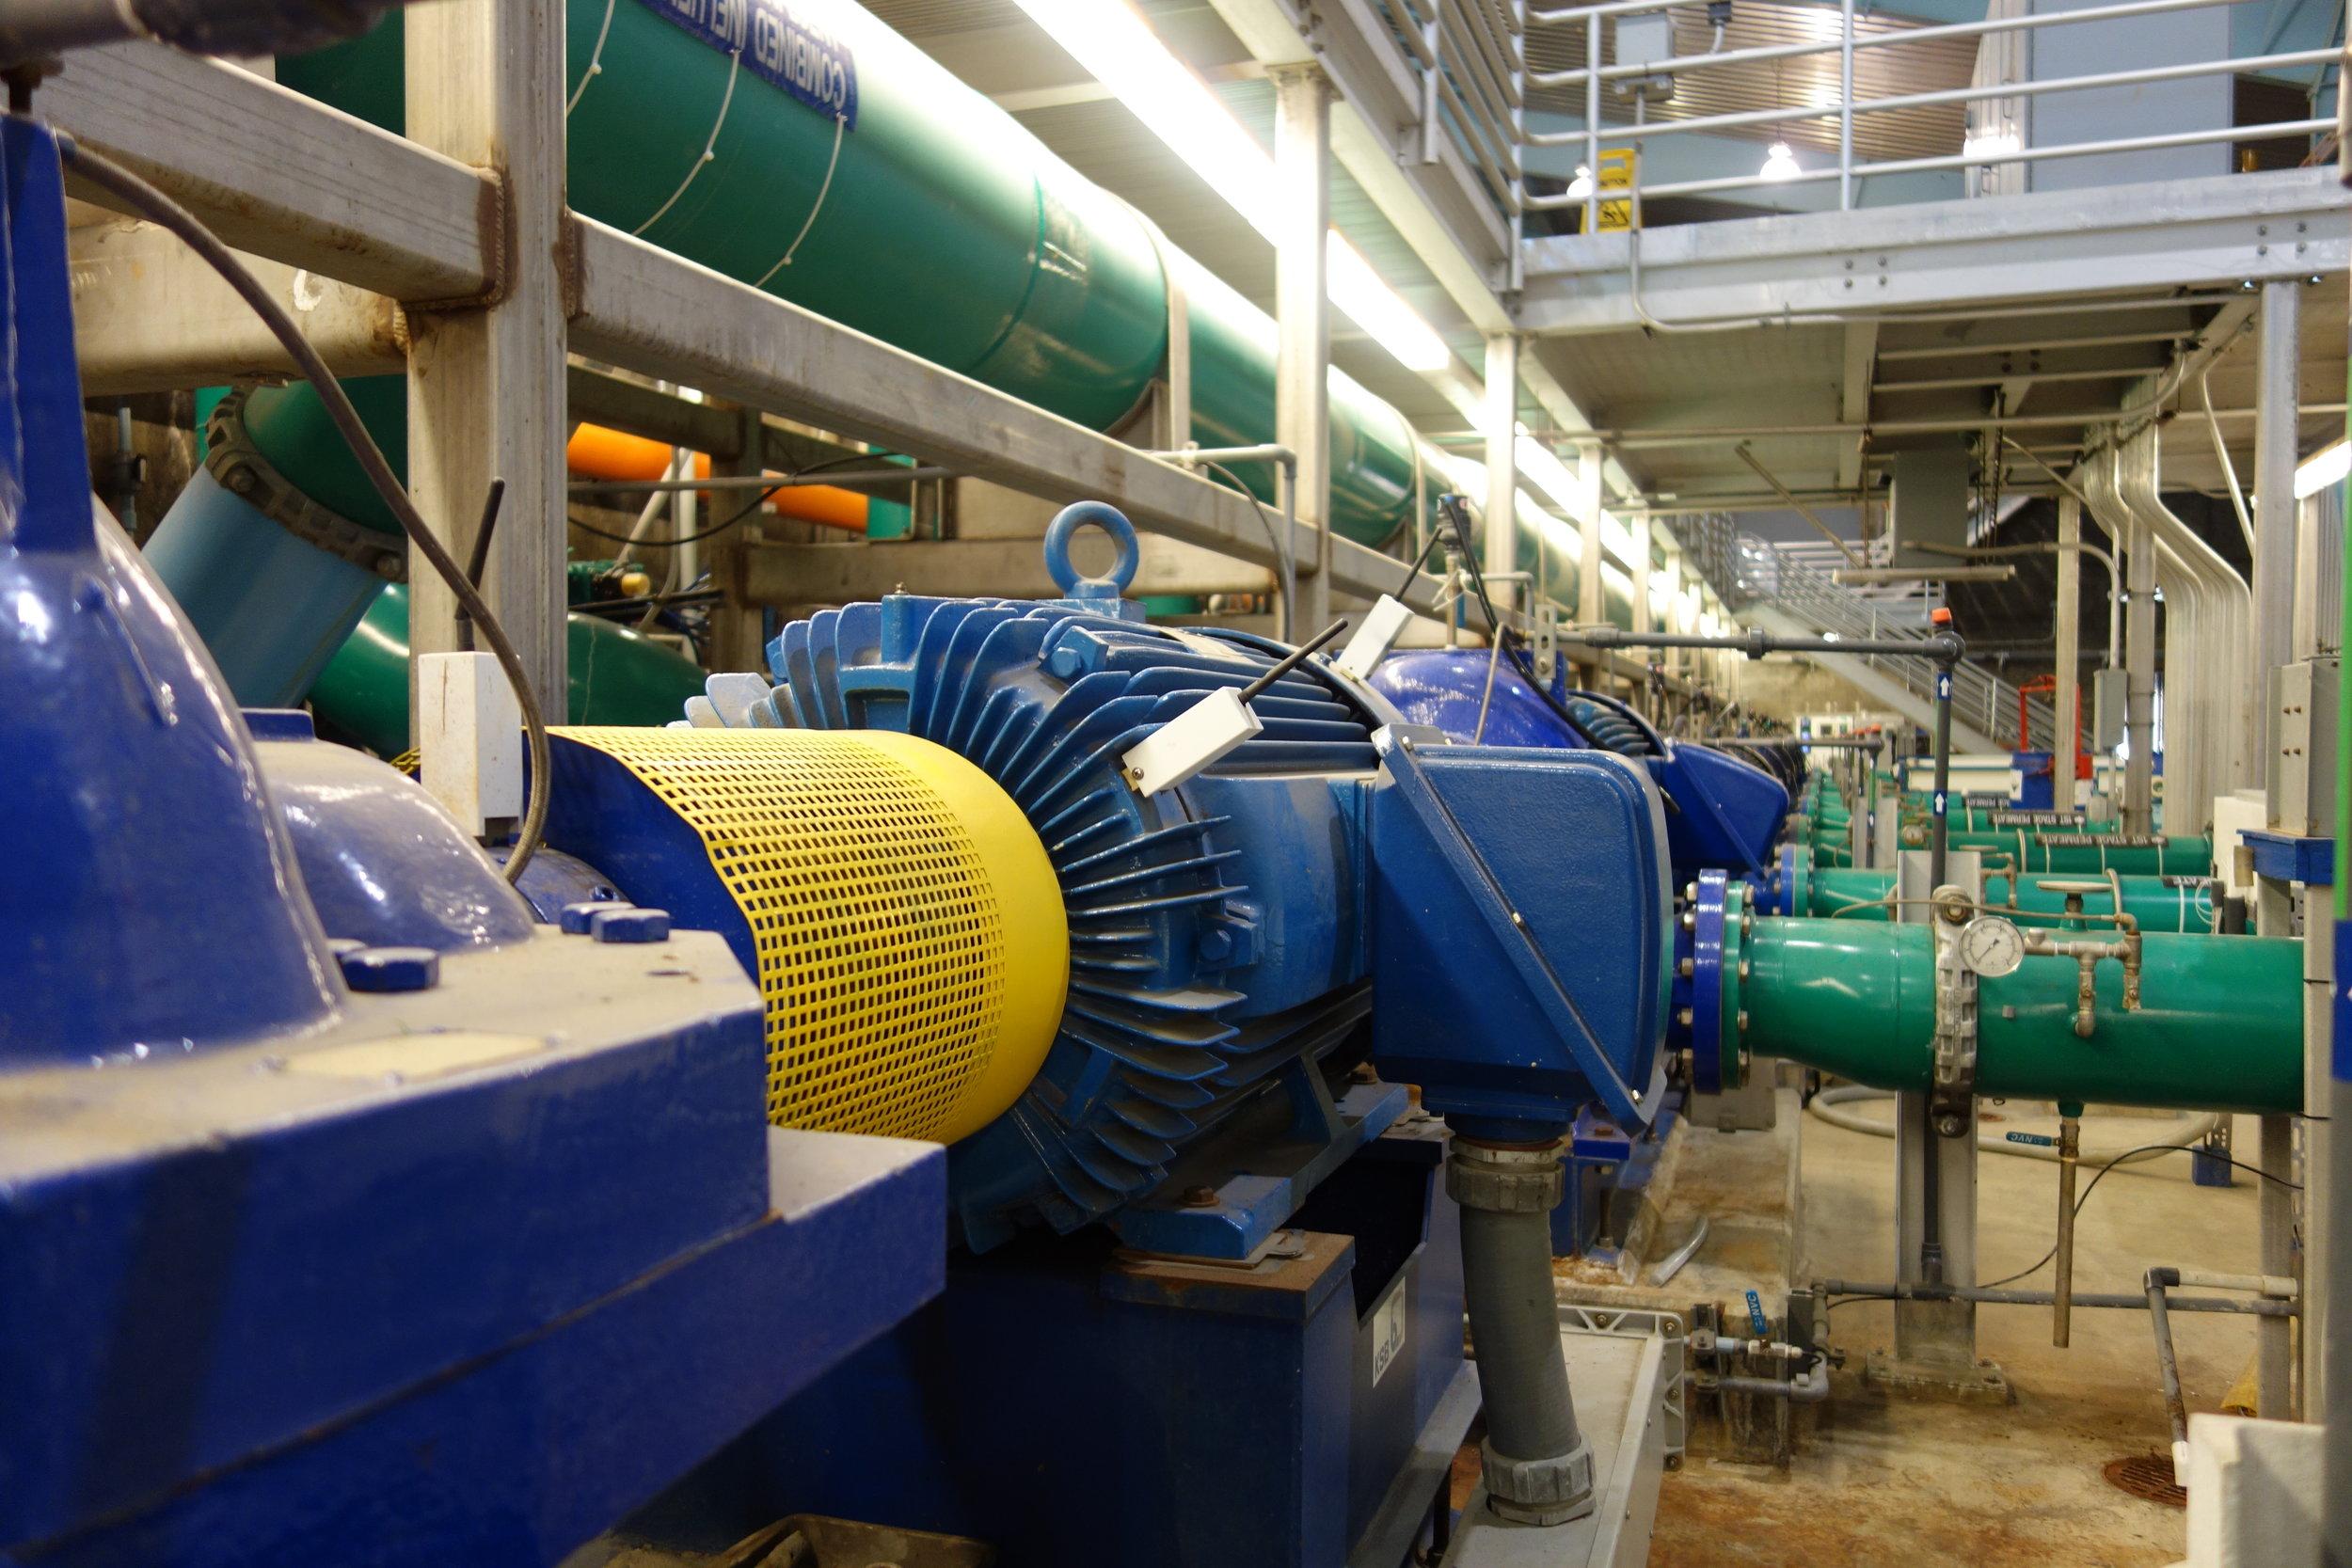 SmartHAWK wireless vibration and temperature sensors monitoring motors at a water treatment plant.